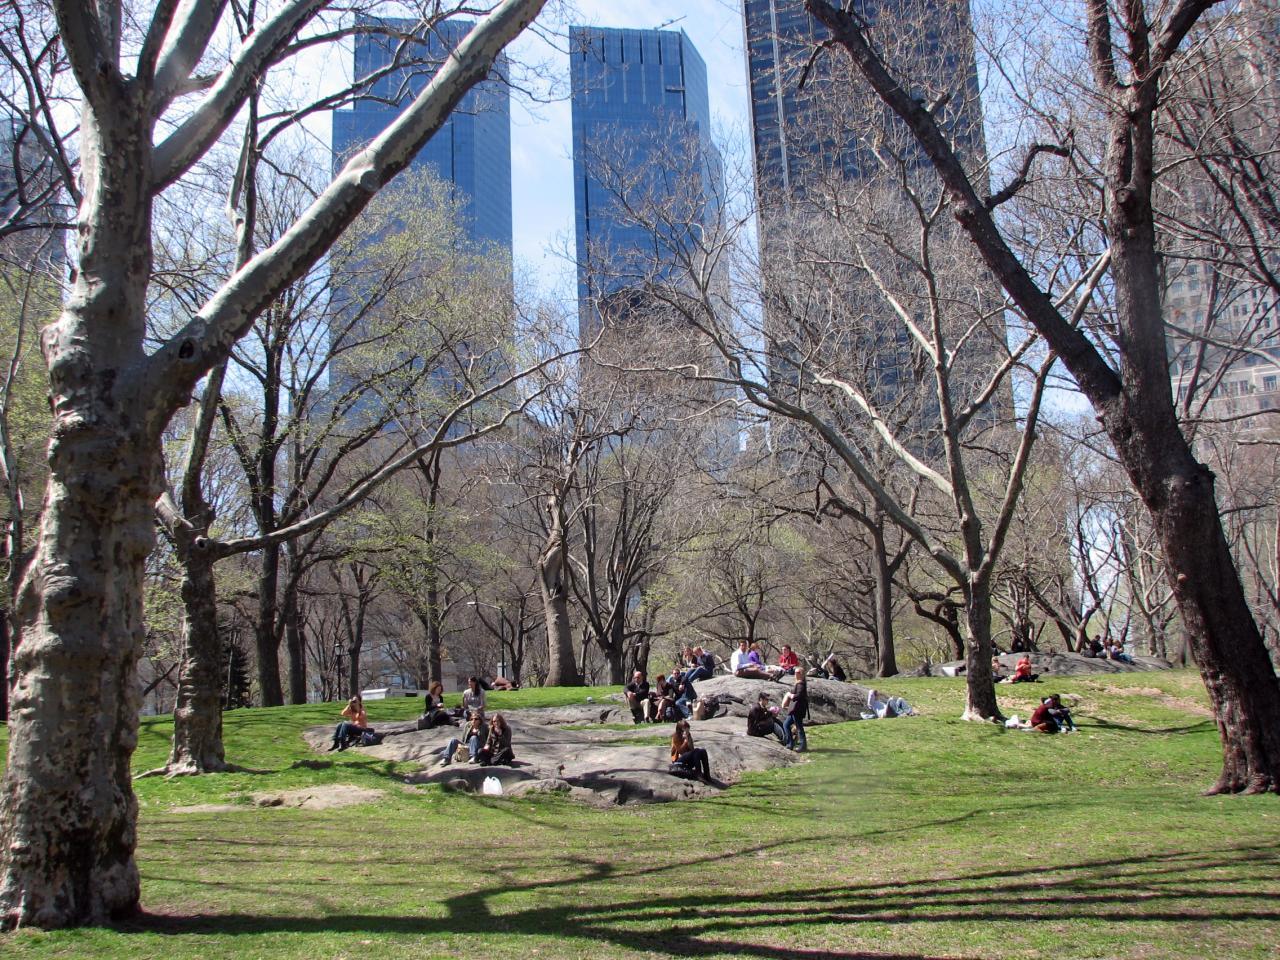 04.16.09 Central Park (12)